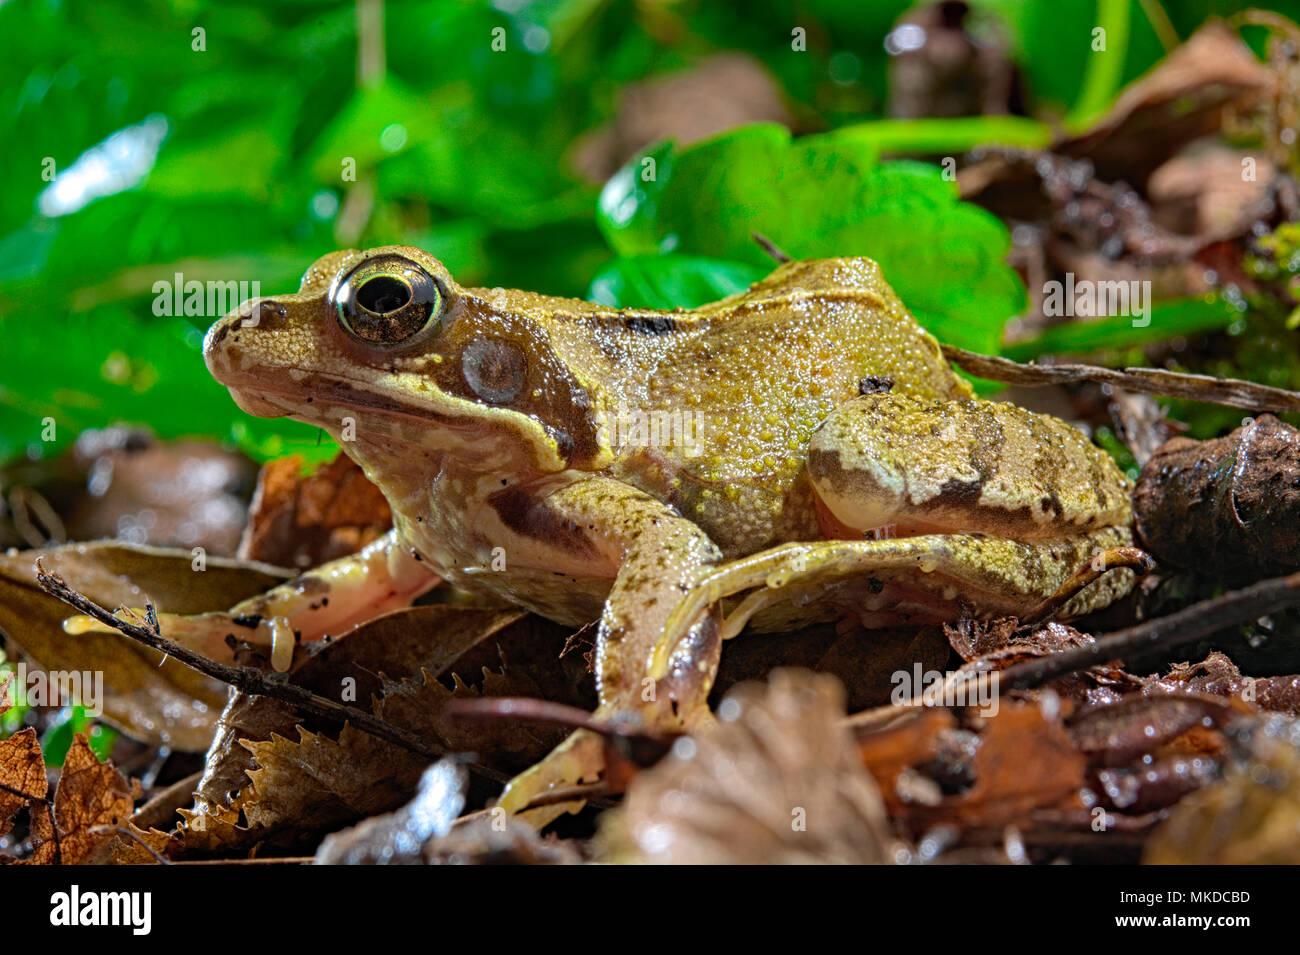 Common frog (Rana temporaria), France - Stock Image